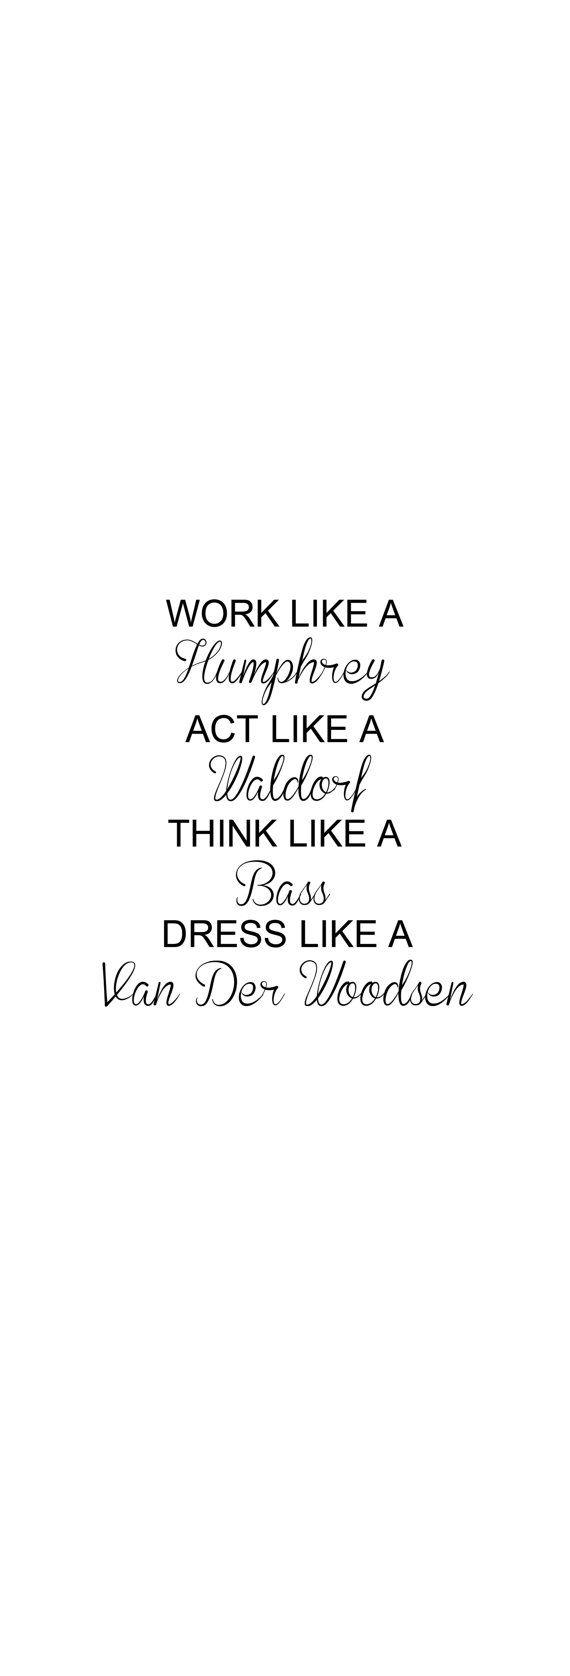 work like a gossip girl humphrey act like by thevinyldestination work like a gossip girl humphrey act like by thevinyldestination